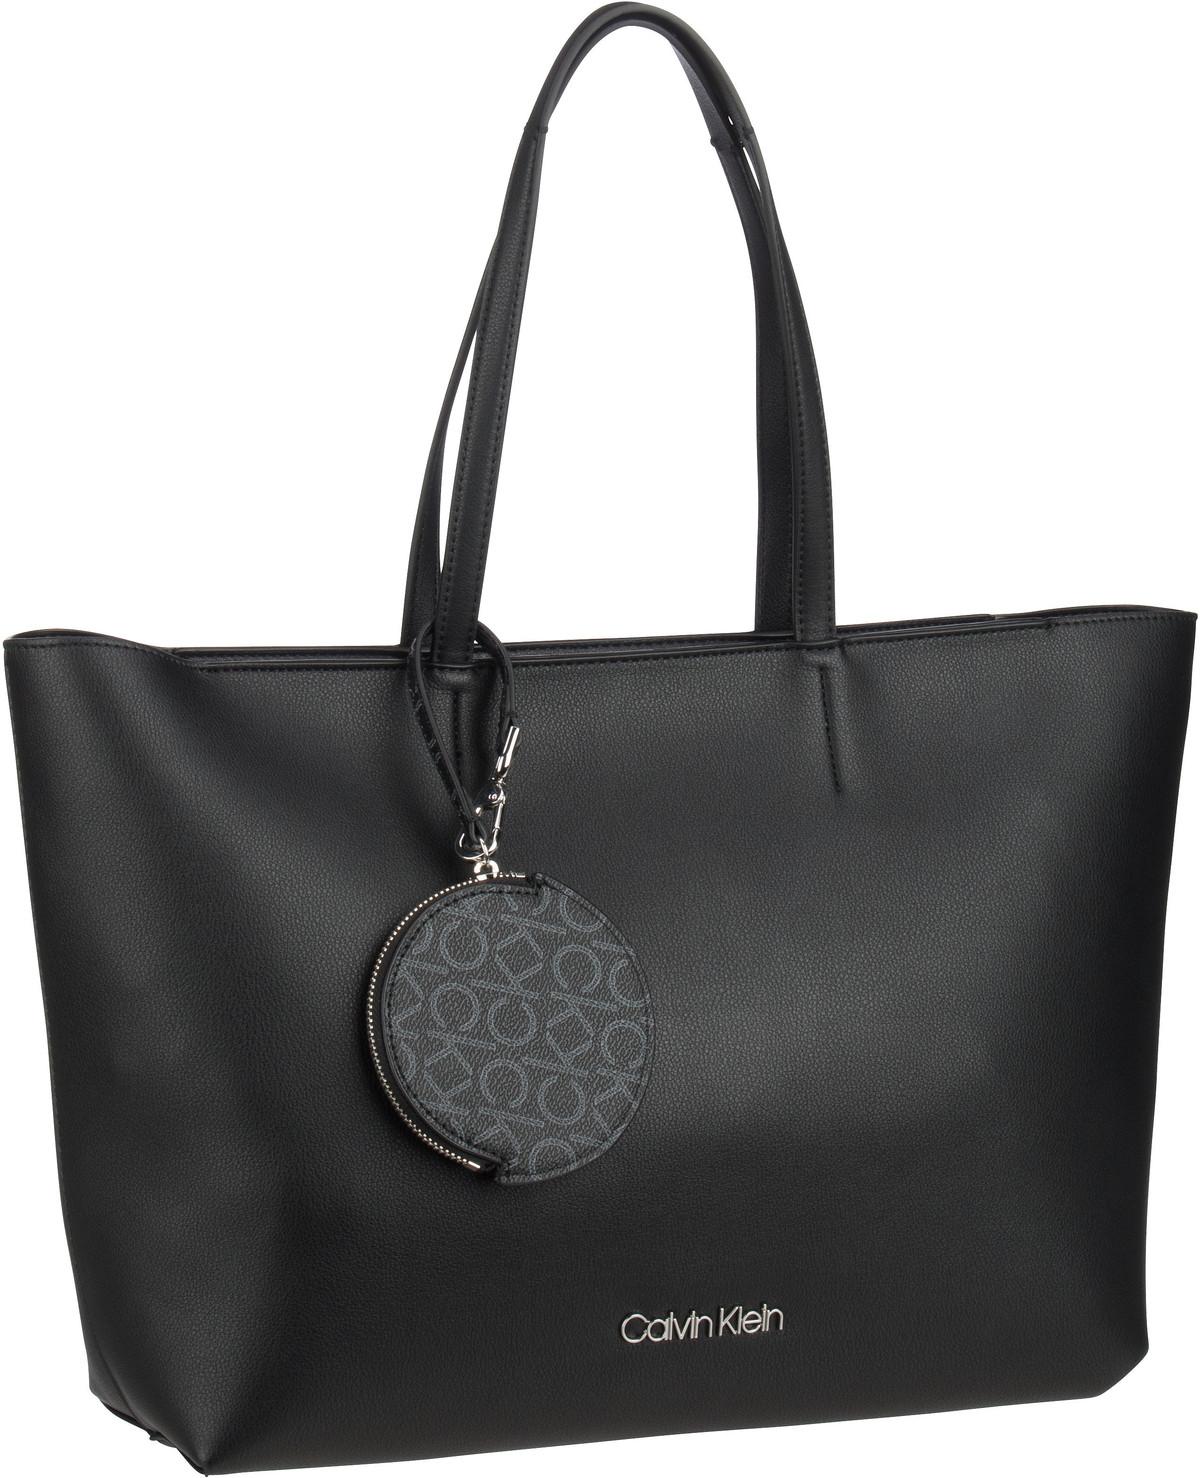 calvin klein -  Handtasche CK Must Shopper MD SP20 Black